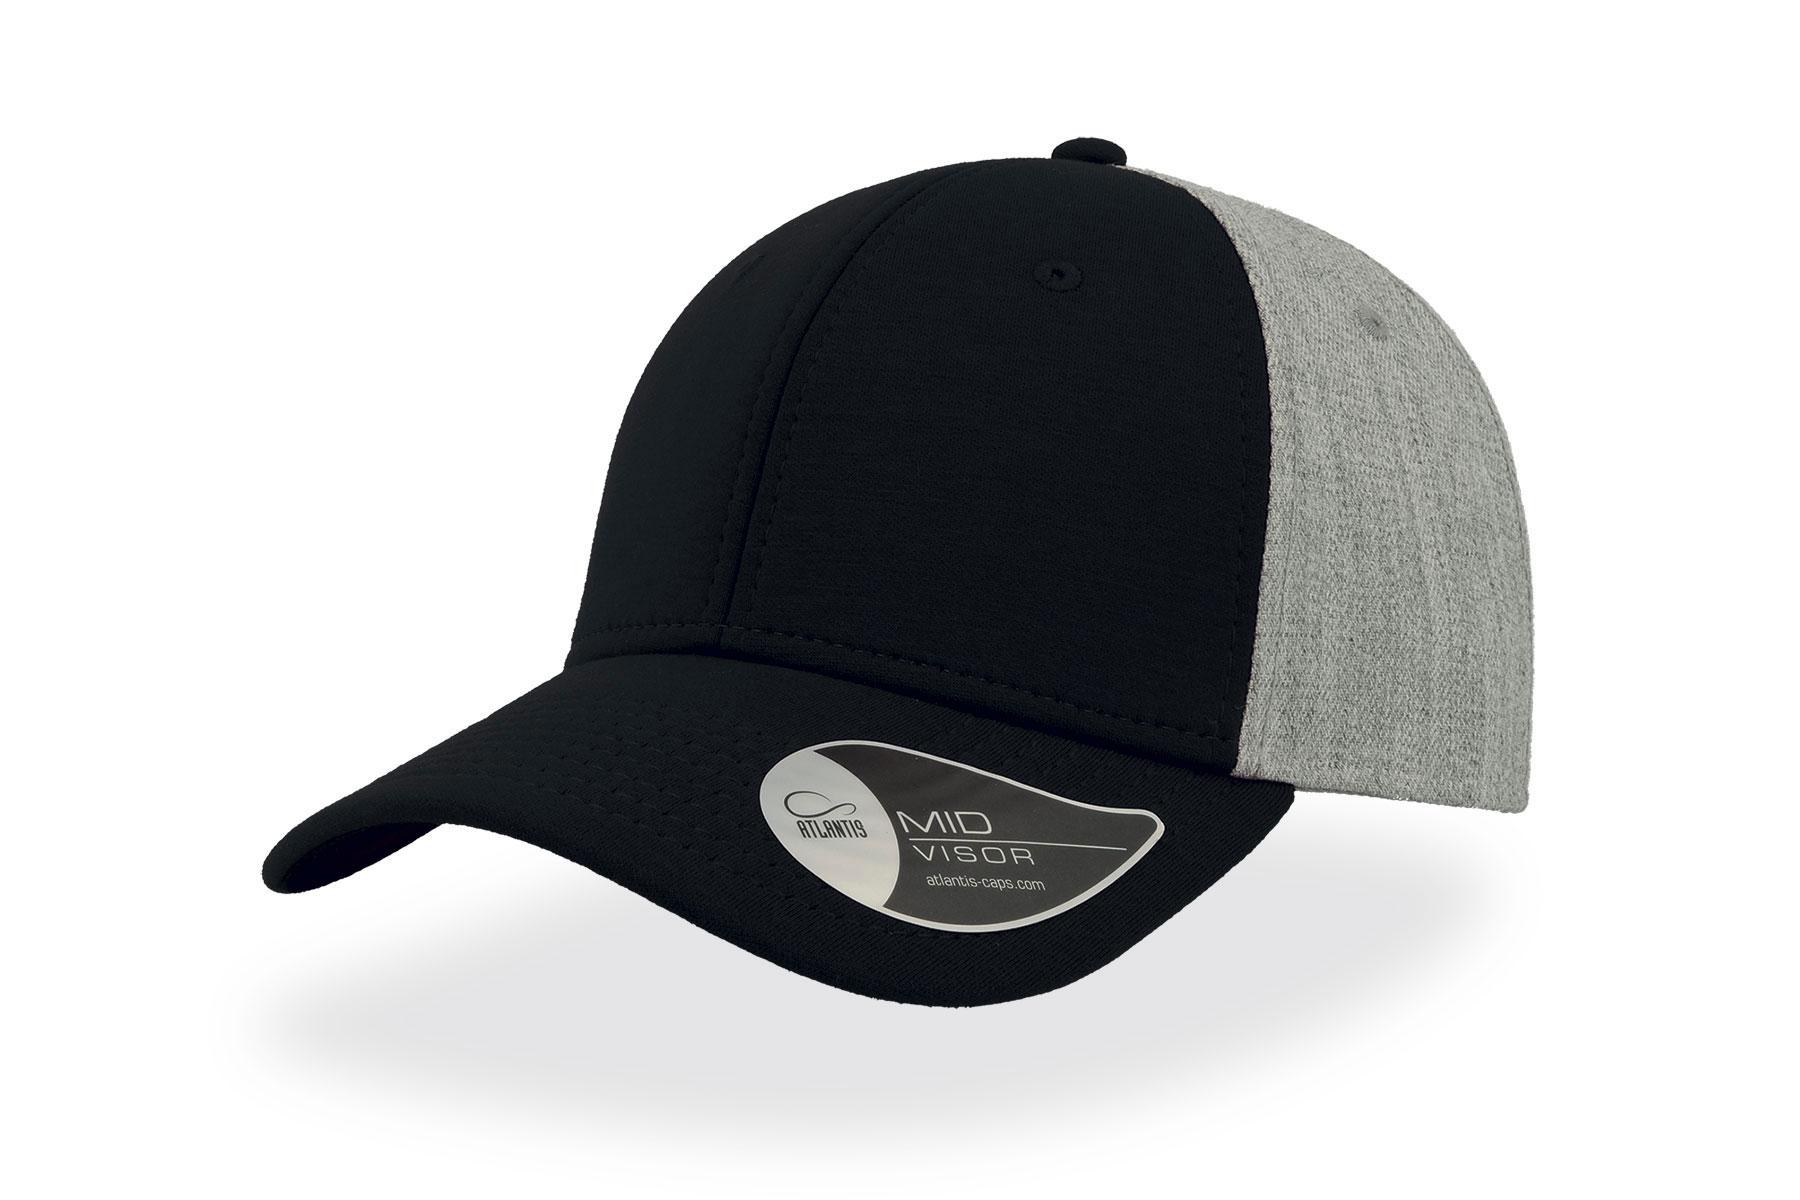 Contest Mid Visor-lippis - NEW 2019 ATLANTIS CAPS & HATS - CONT - 2